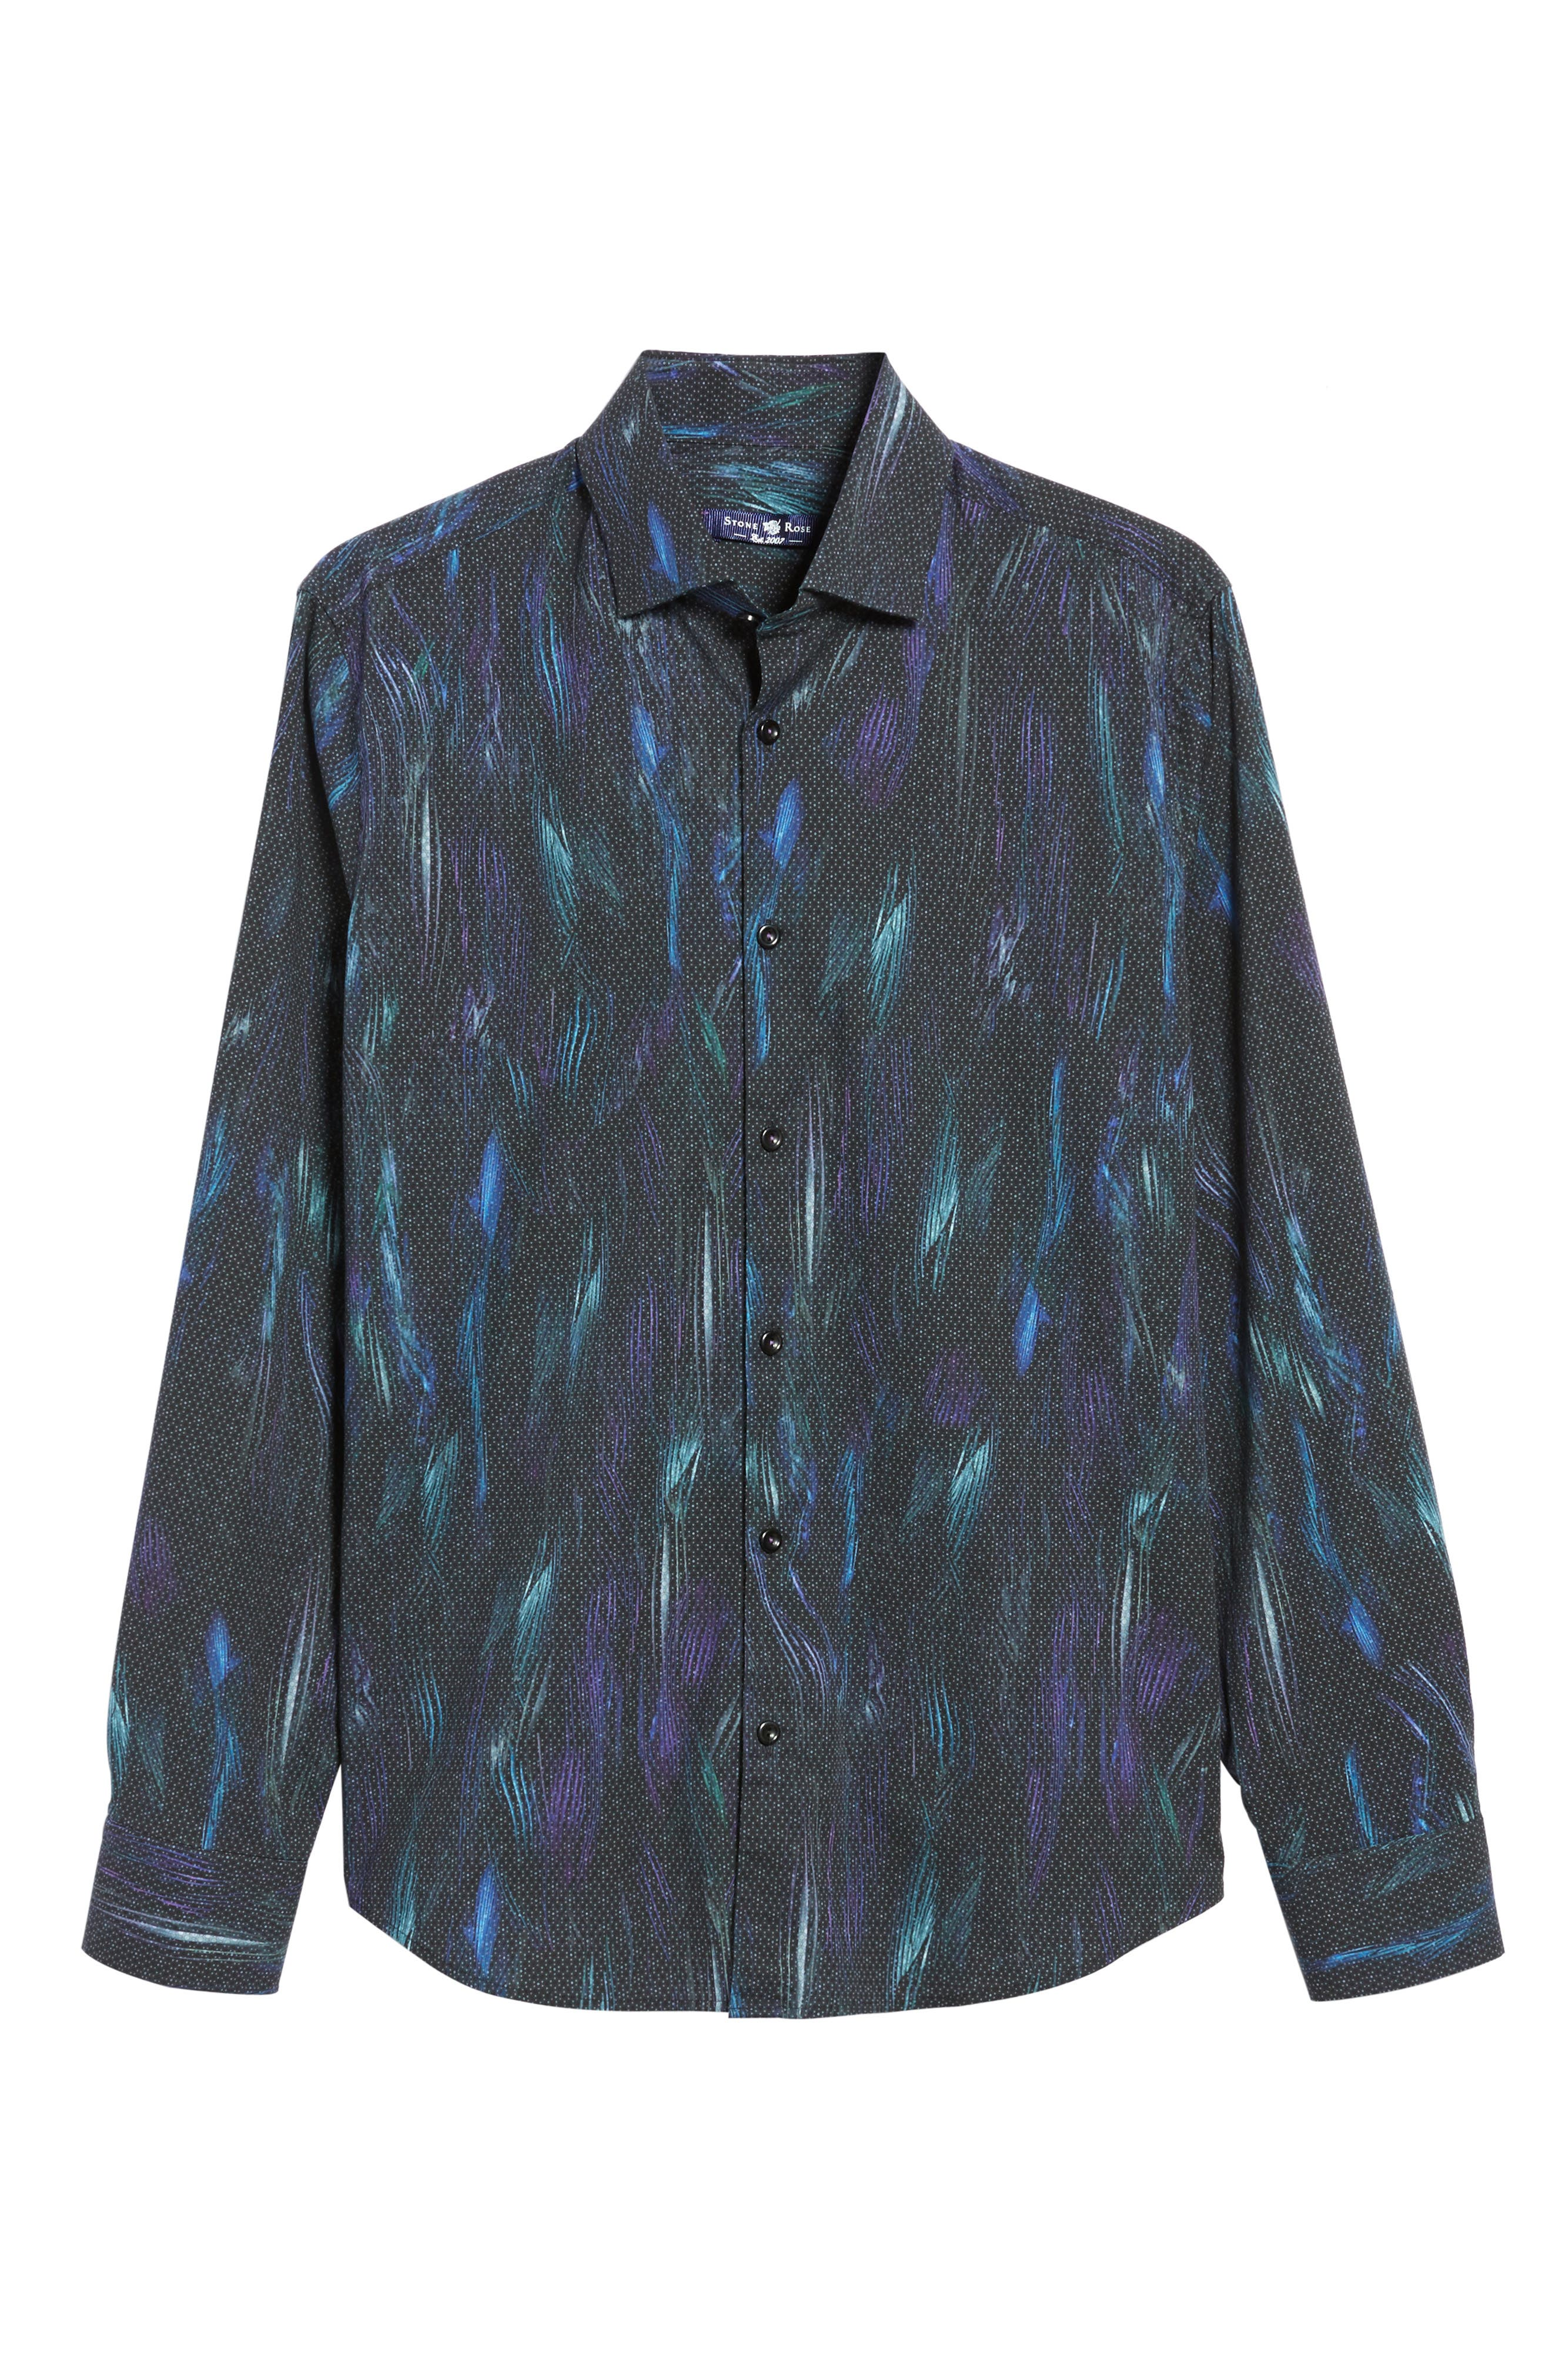 STONE ROSE,                             Slim Fit Geo FX Print Sport Shirt,                             Alternate thumbnail 6, color,                             001